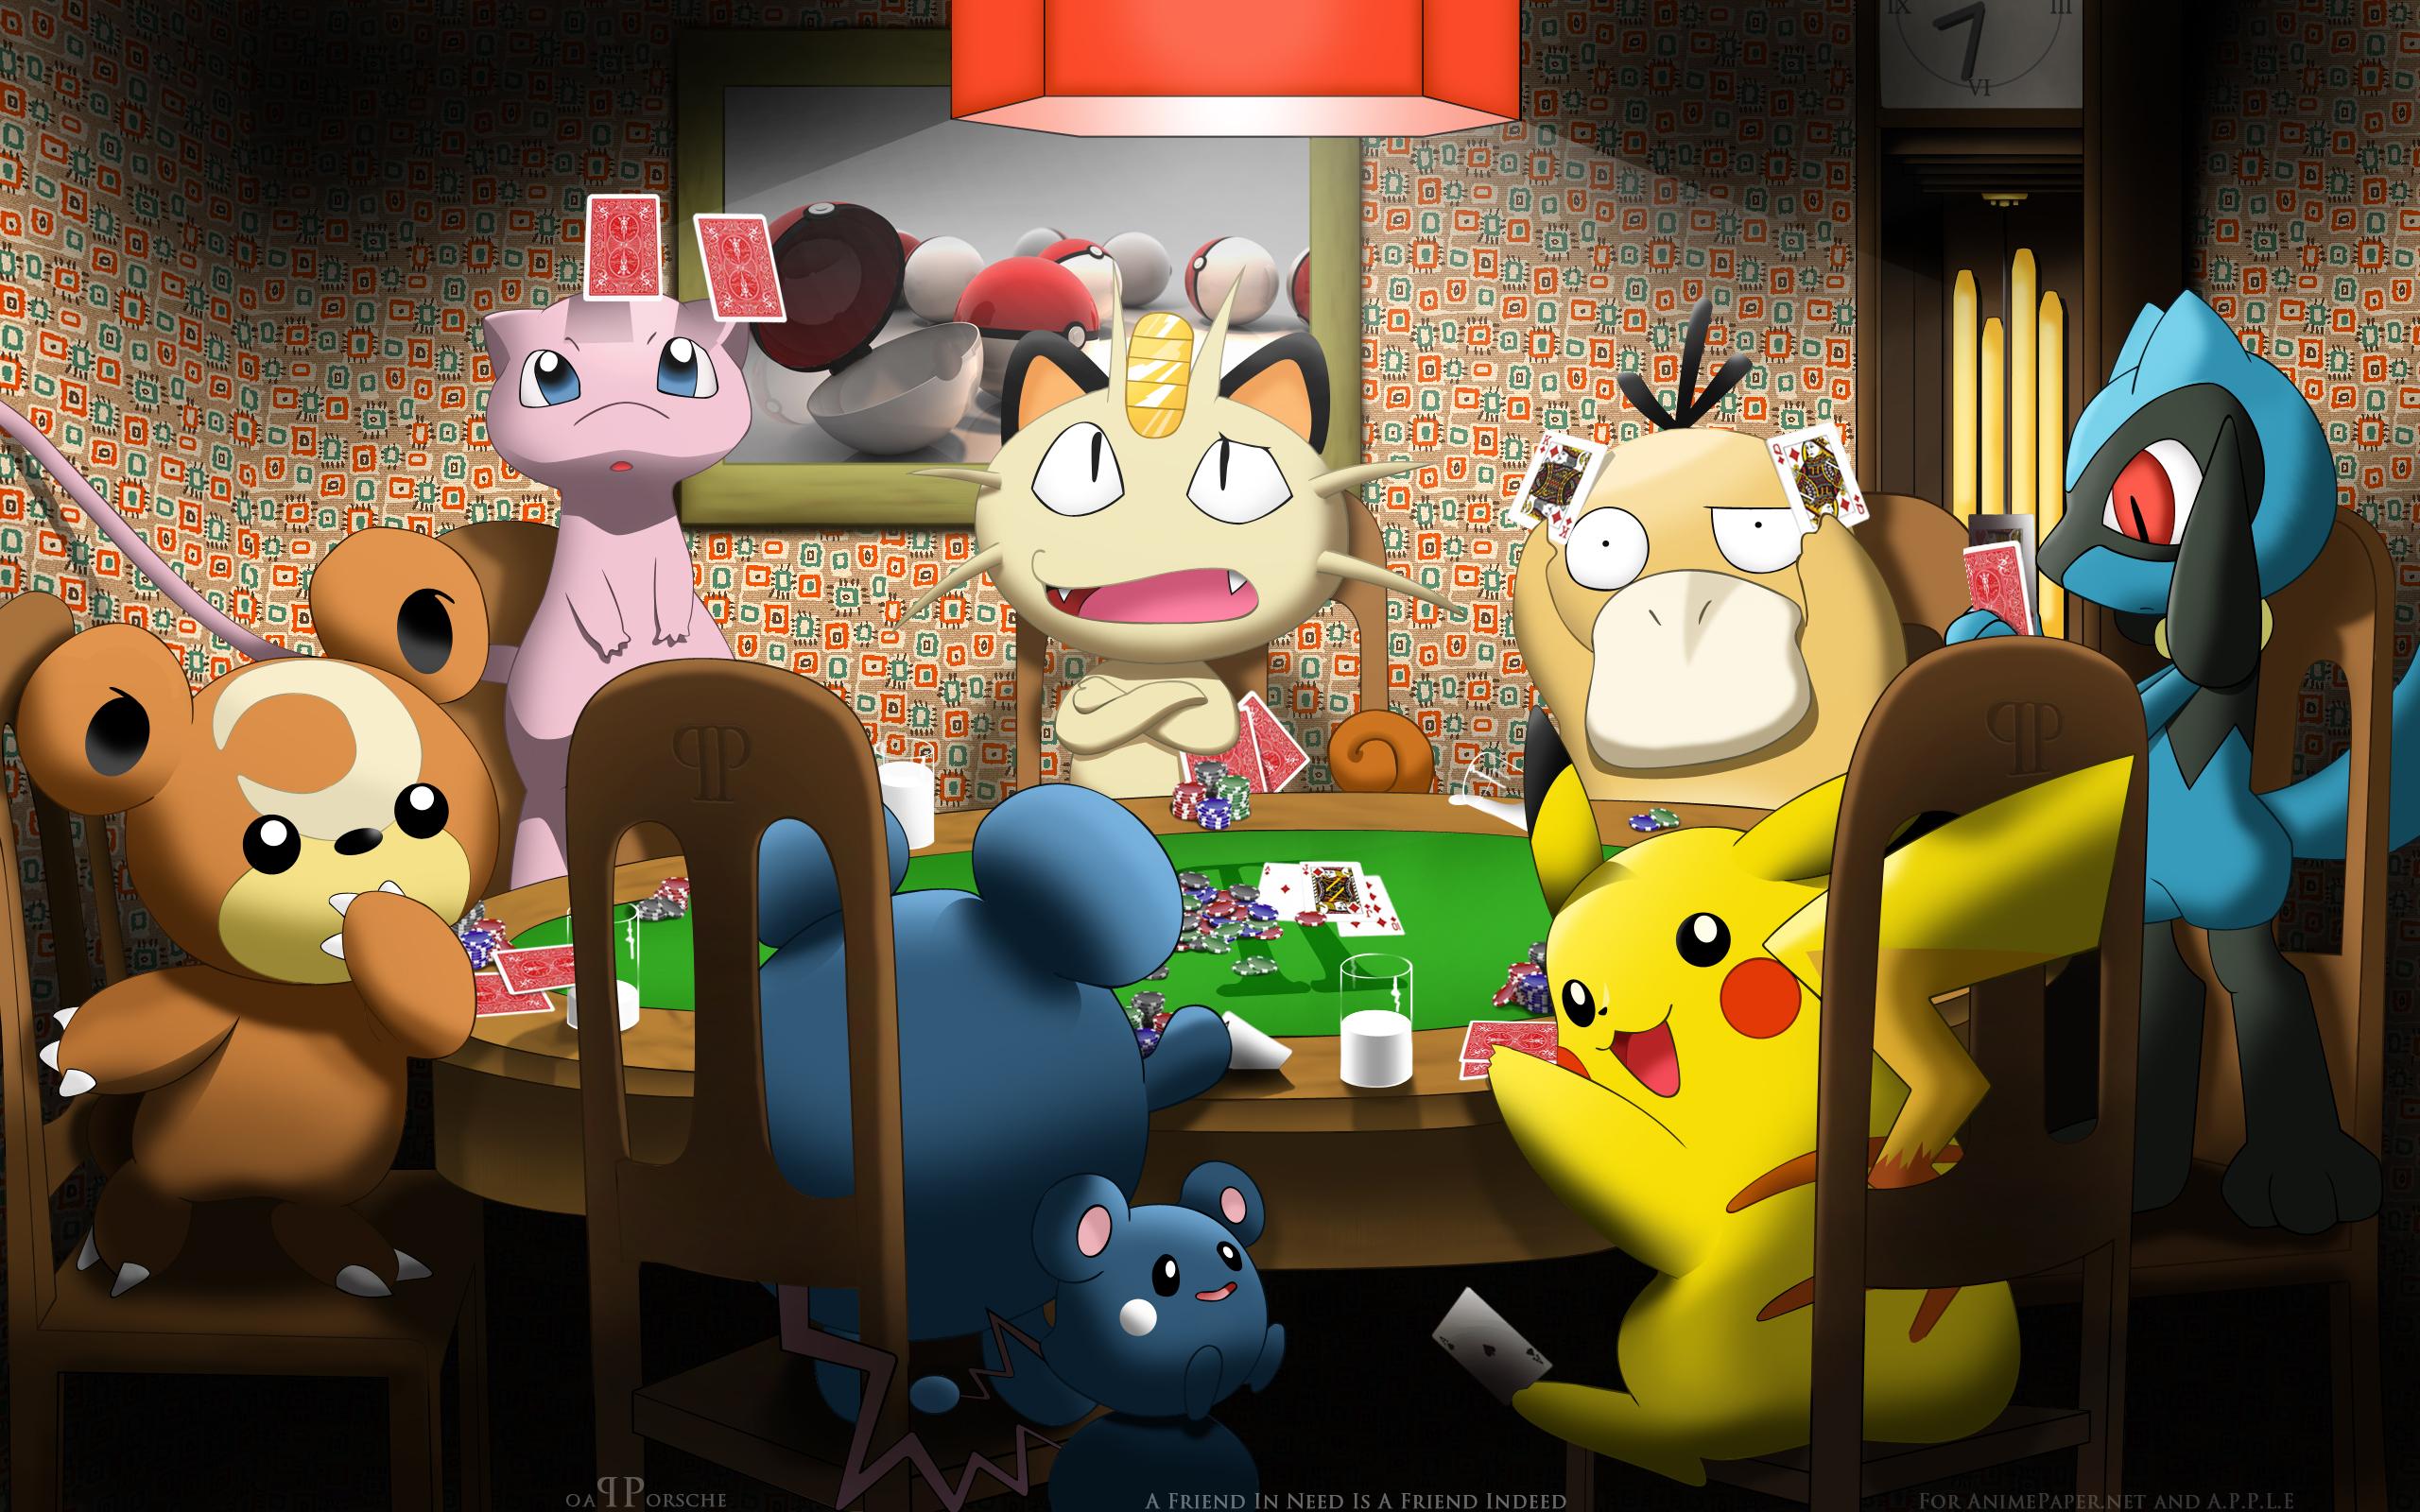 Tags: Wallpaper, Pokémon, Pikachu, Meowth, Psyduck, Mew, Riolu, Teddiursa, HD Wallpaper